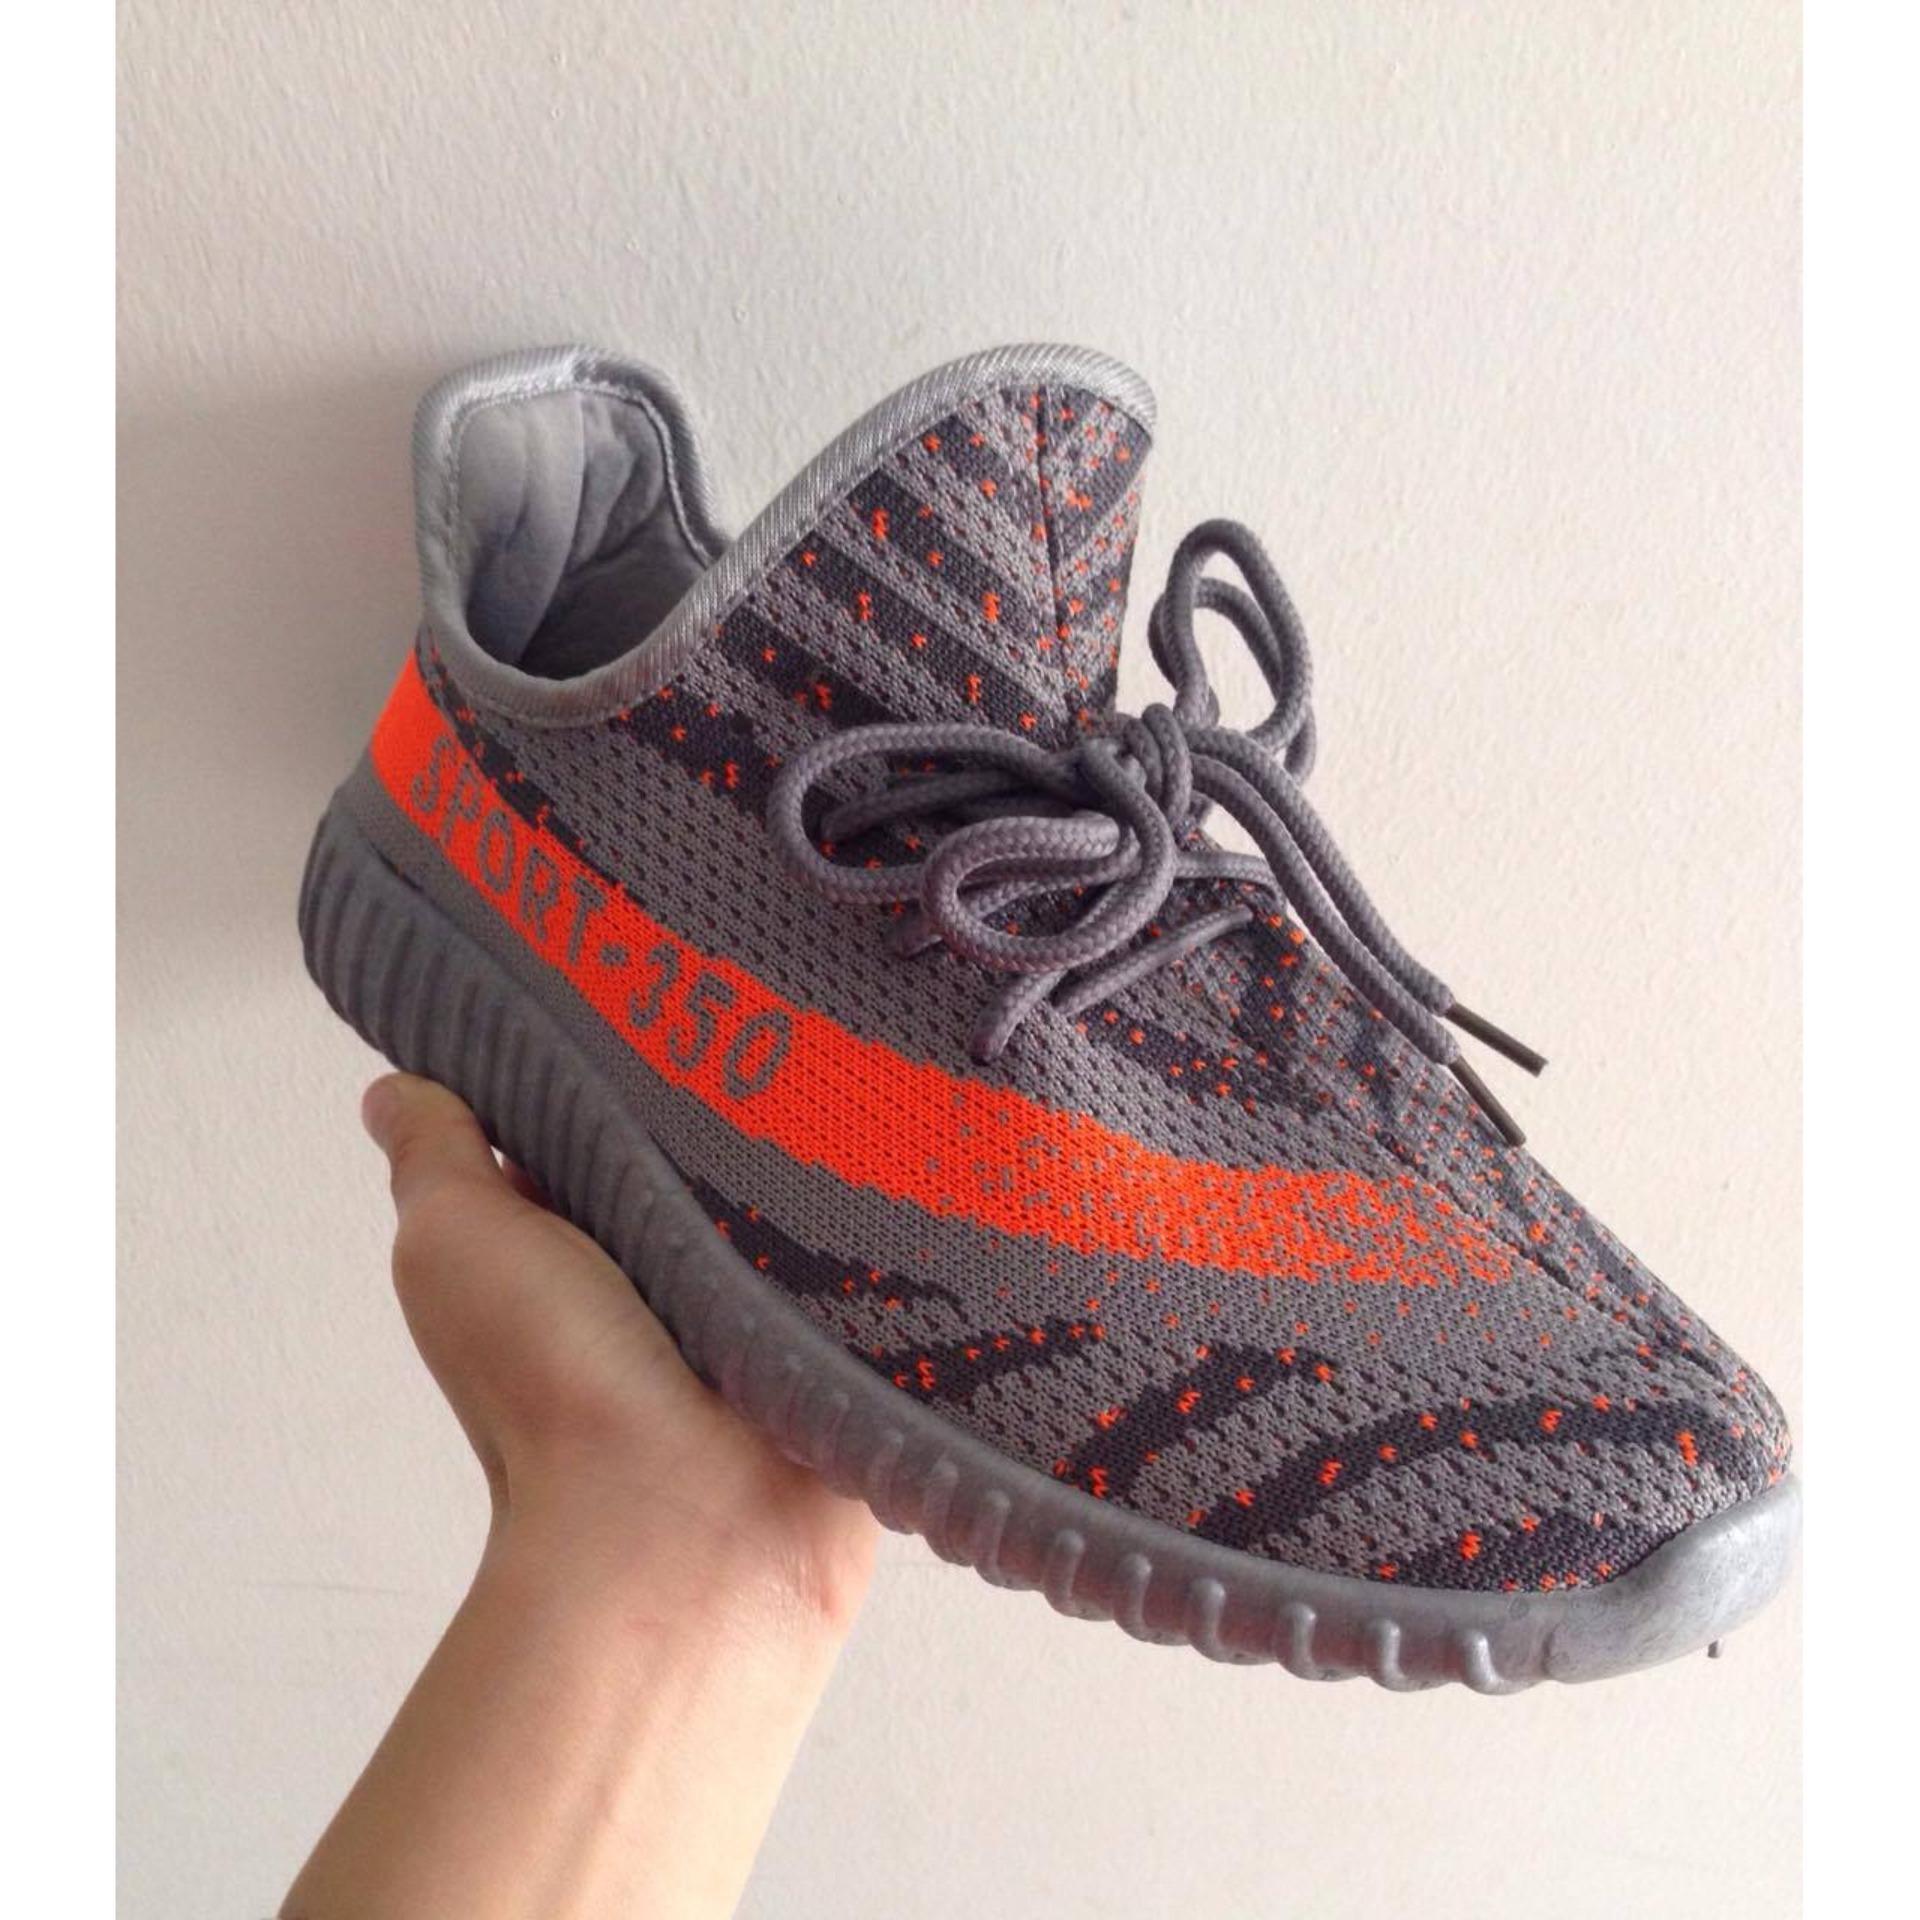 Mua Giay Sneaker Mbs020 Mới